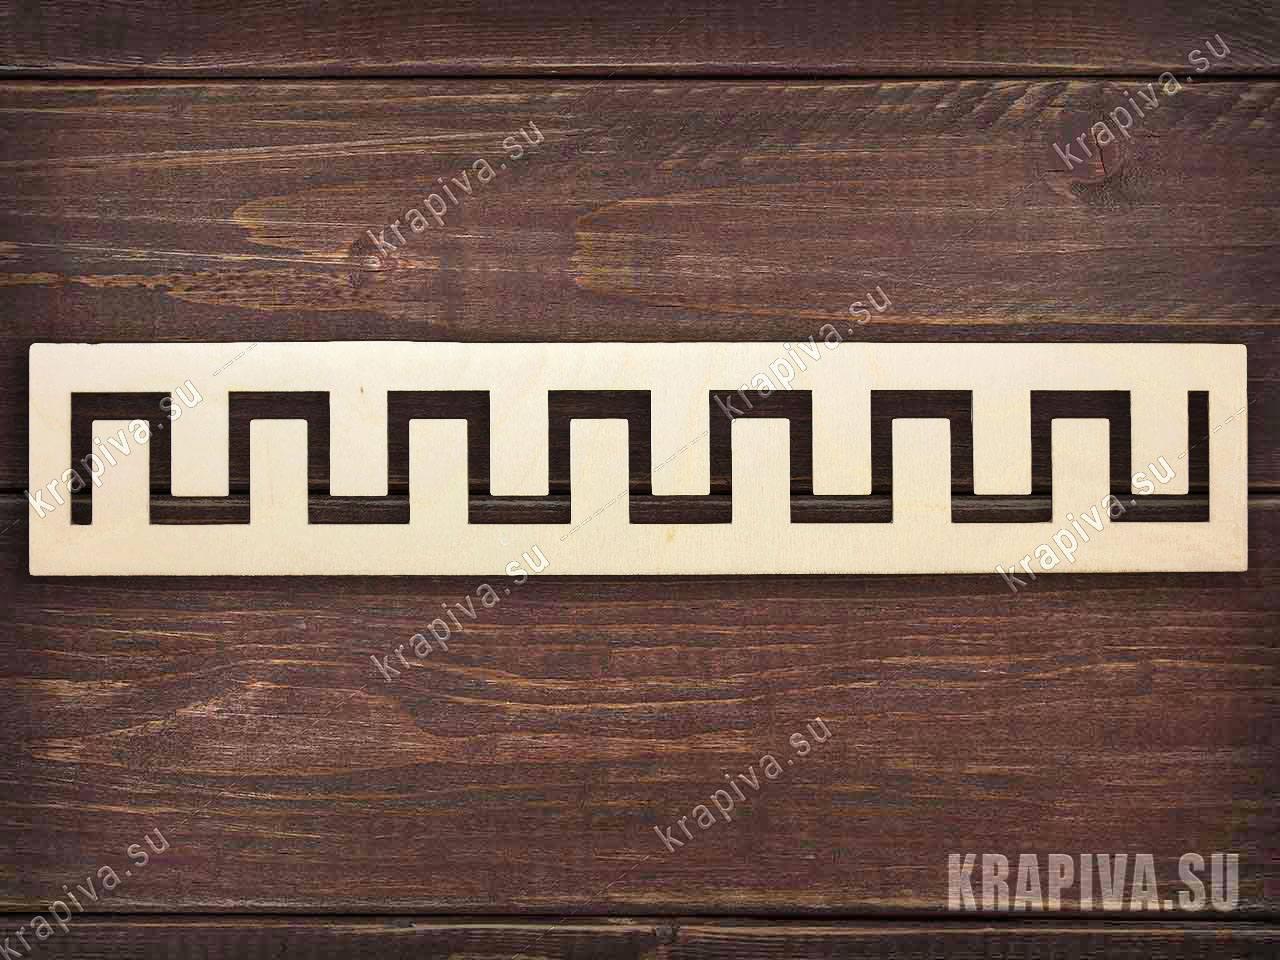 Развивающая линейка №4 за 46 руб. в магазине Крапива (krapiva.su) (фото)